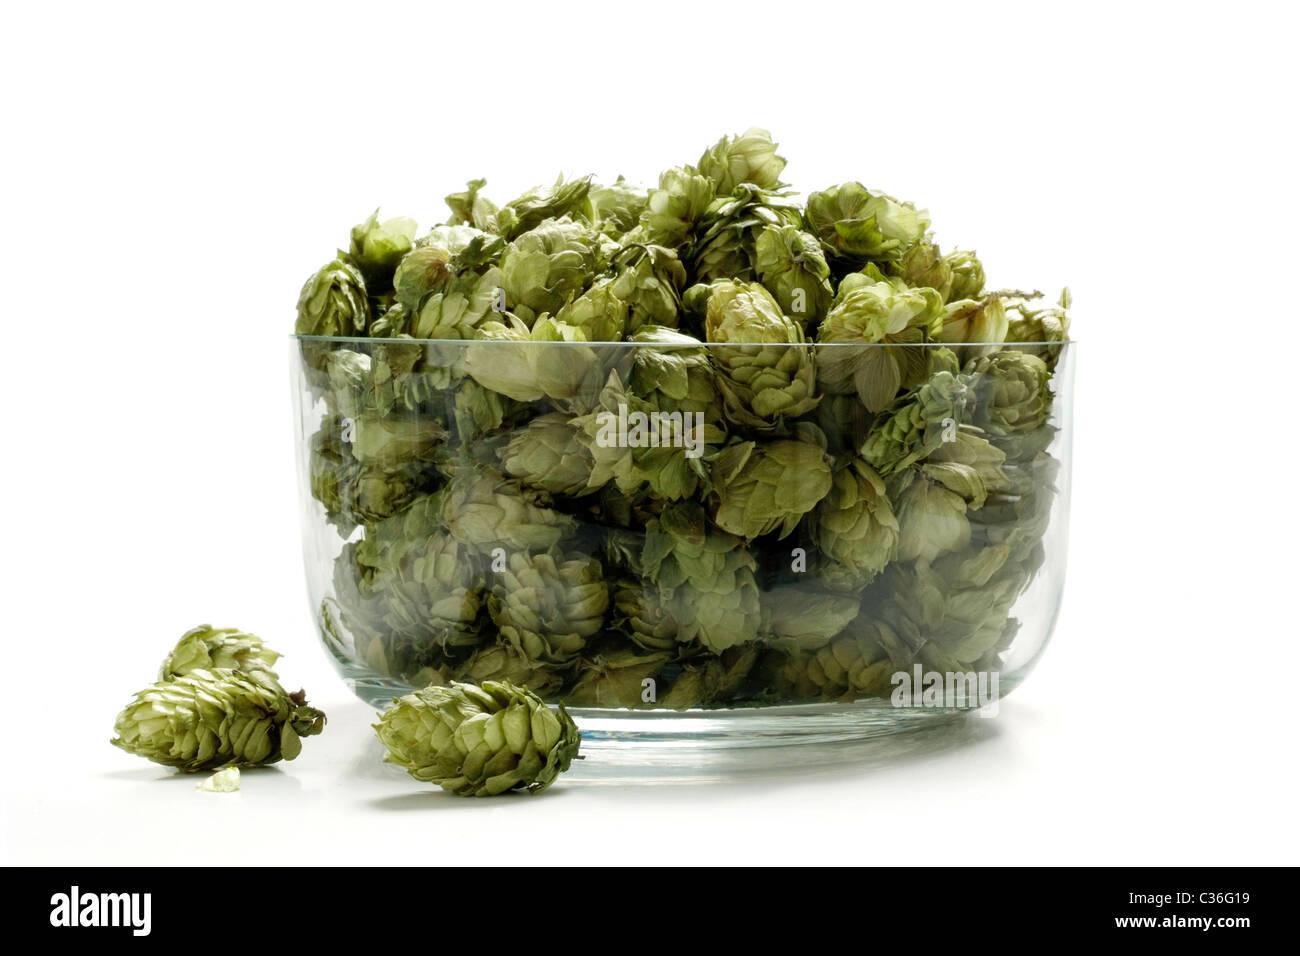 Hop - Stock Image